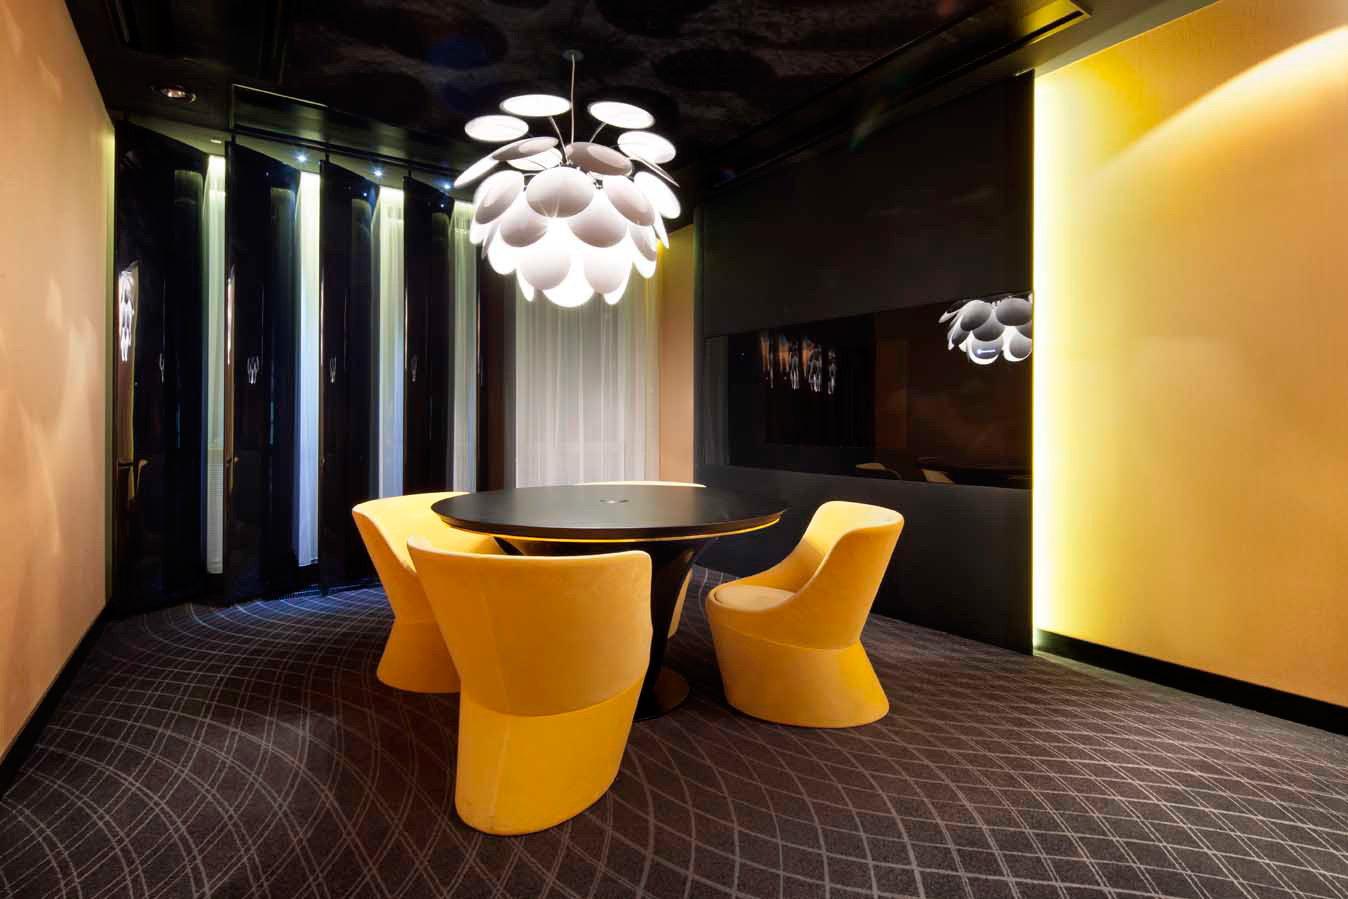 Pko bank polski private banking centre by robert majkut design